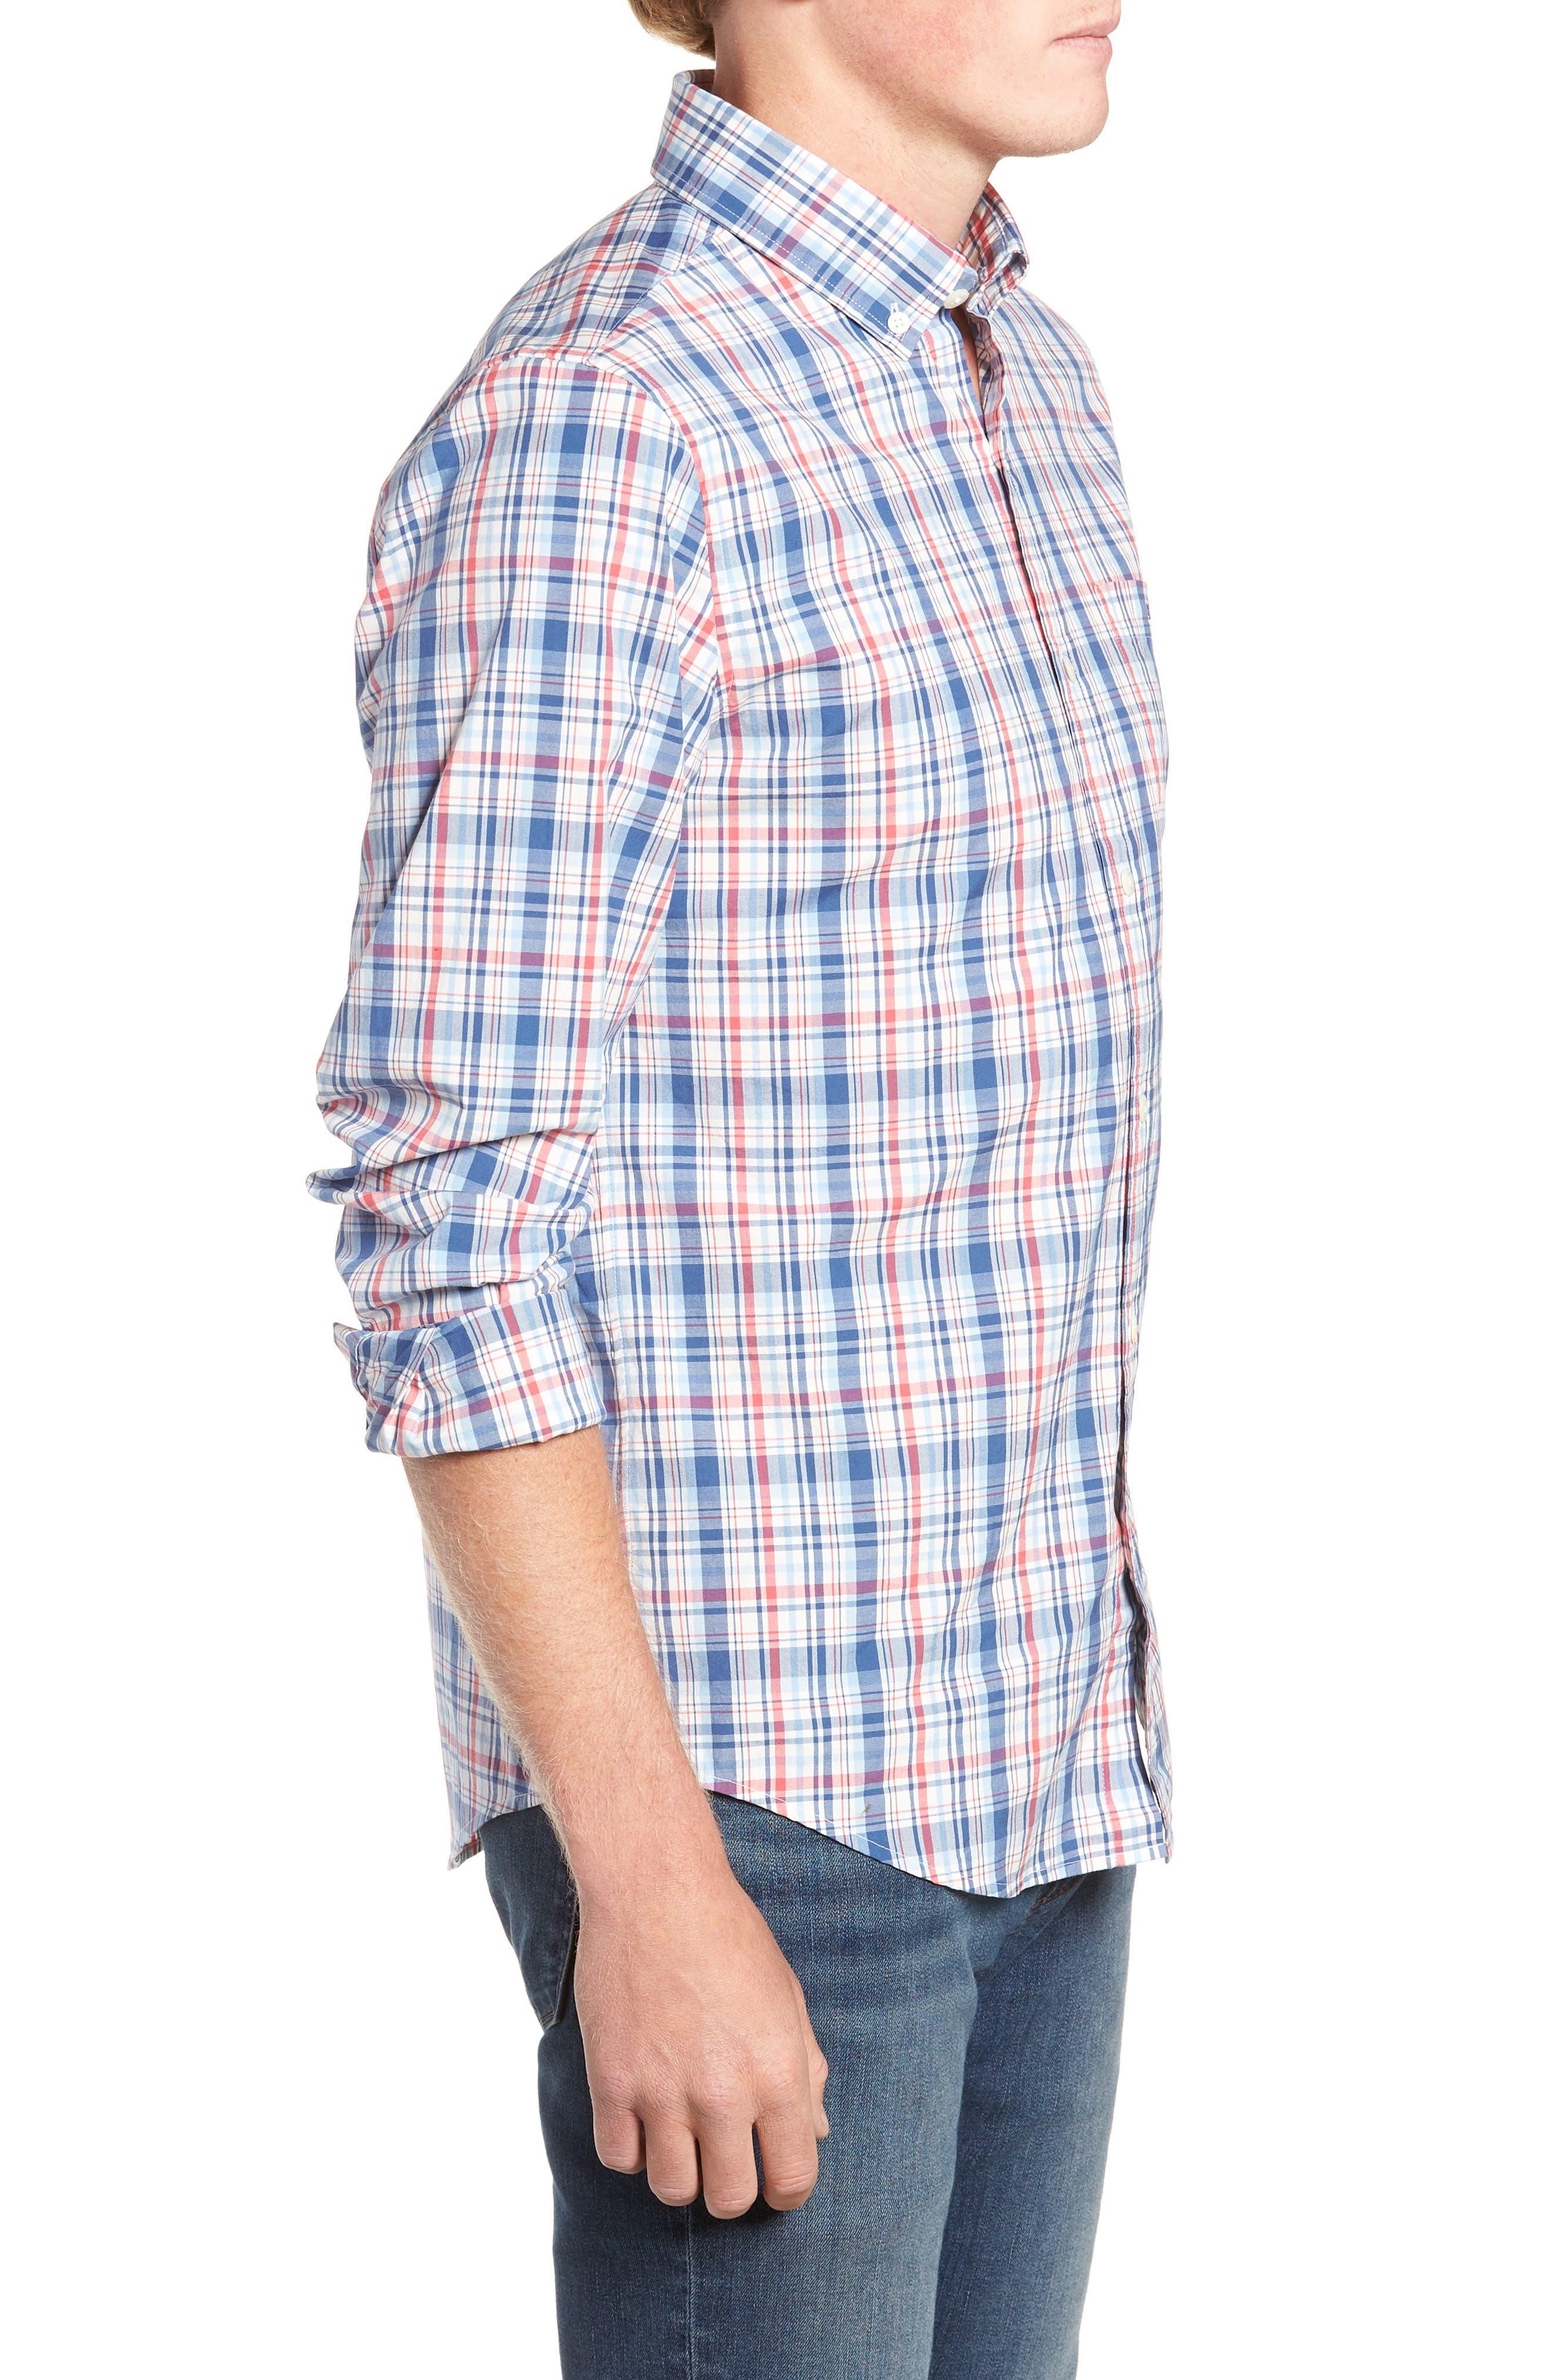 Duke's County Slim Fit Plaid Shirt,                             Alternate thumbnail 4, color,                             MOONSHINE